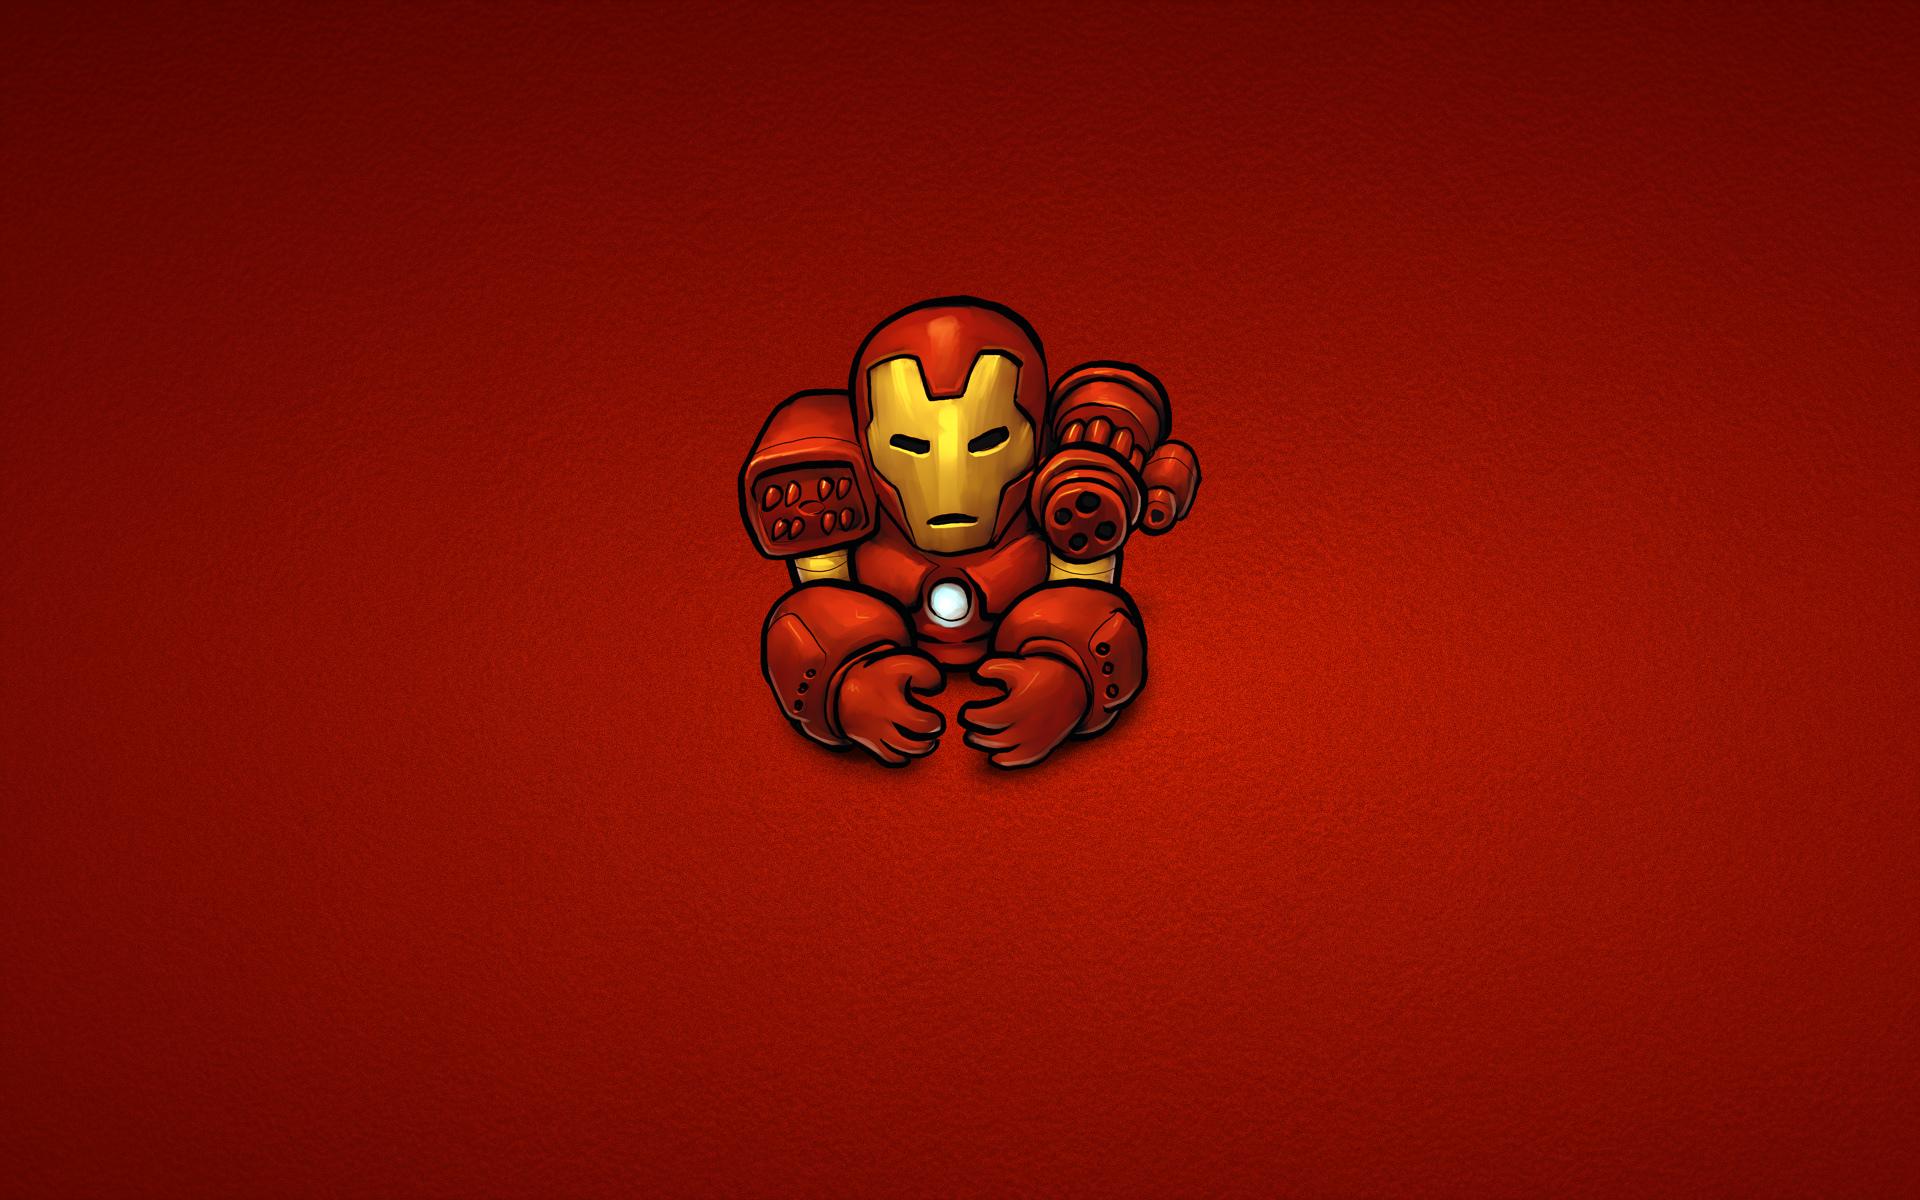 Iron Man Hd Wallpaper Background Image 1920x1200 Id 606468